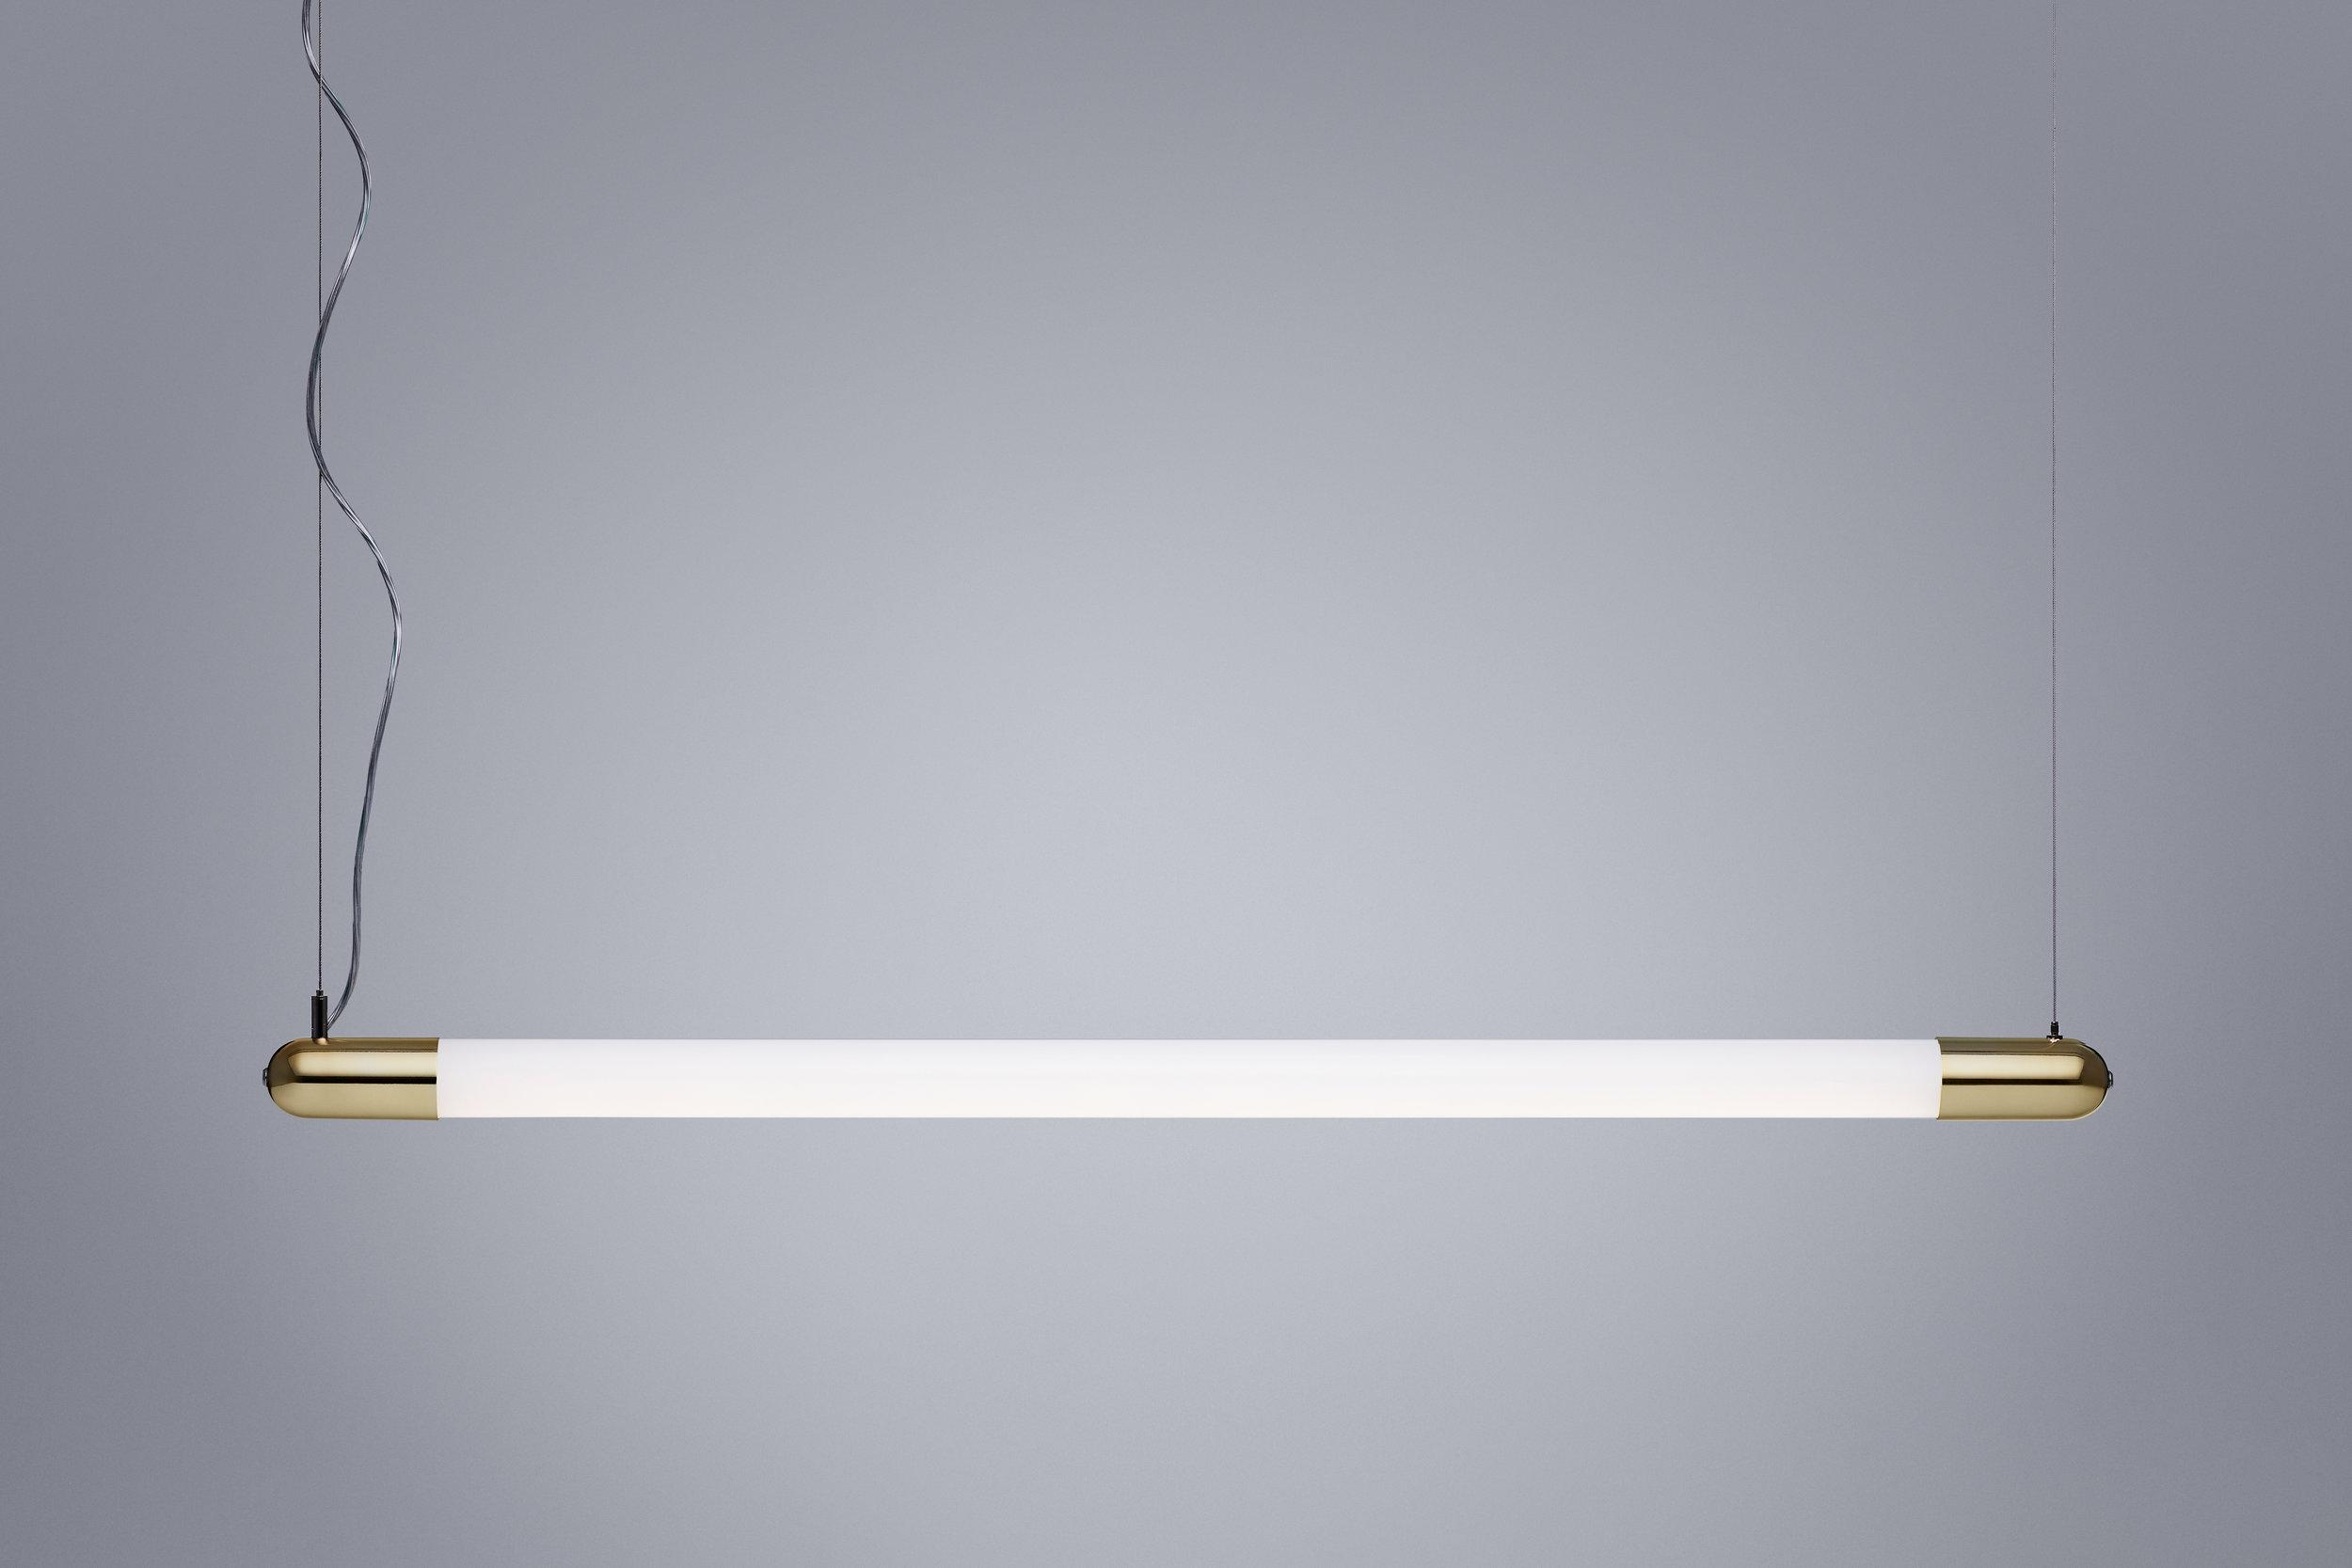 ISM Objects_Snag horizontal long bright brass_Pendant.jpg